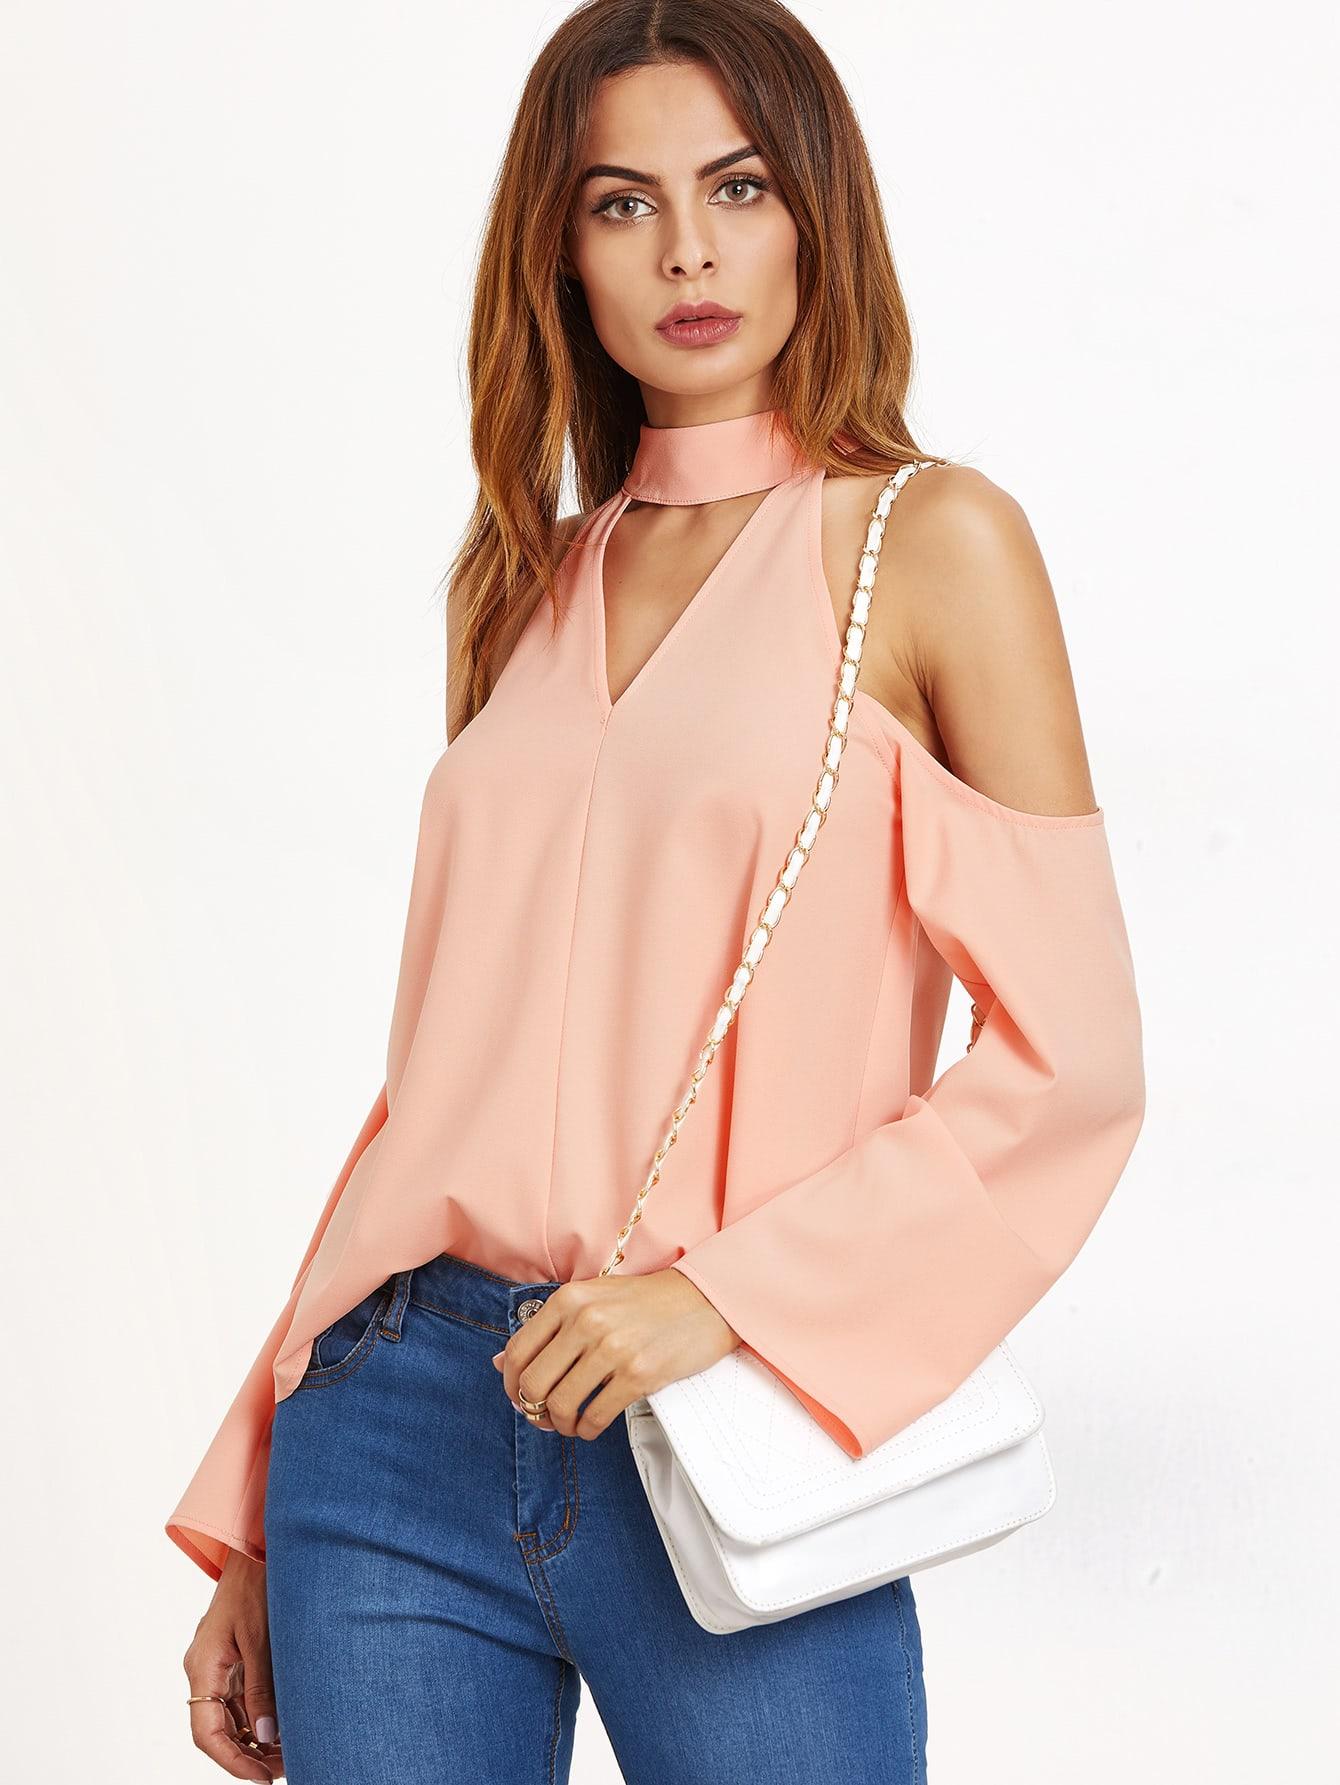 blouse161021703_2